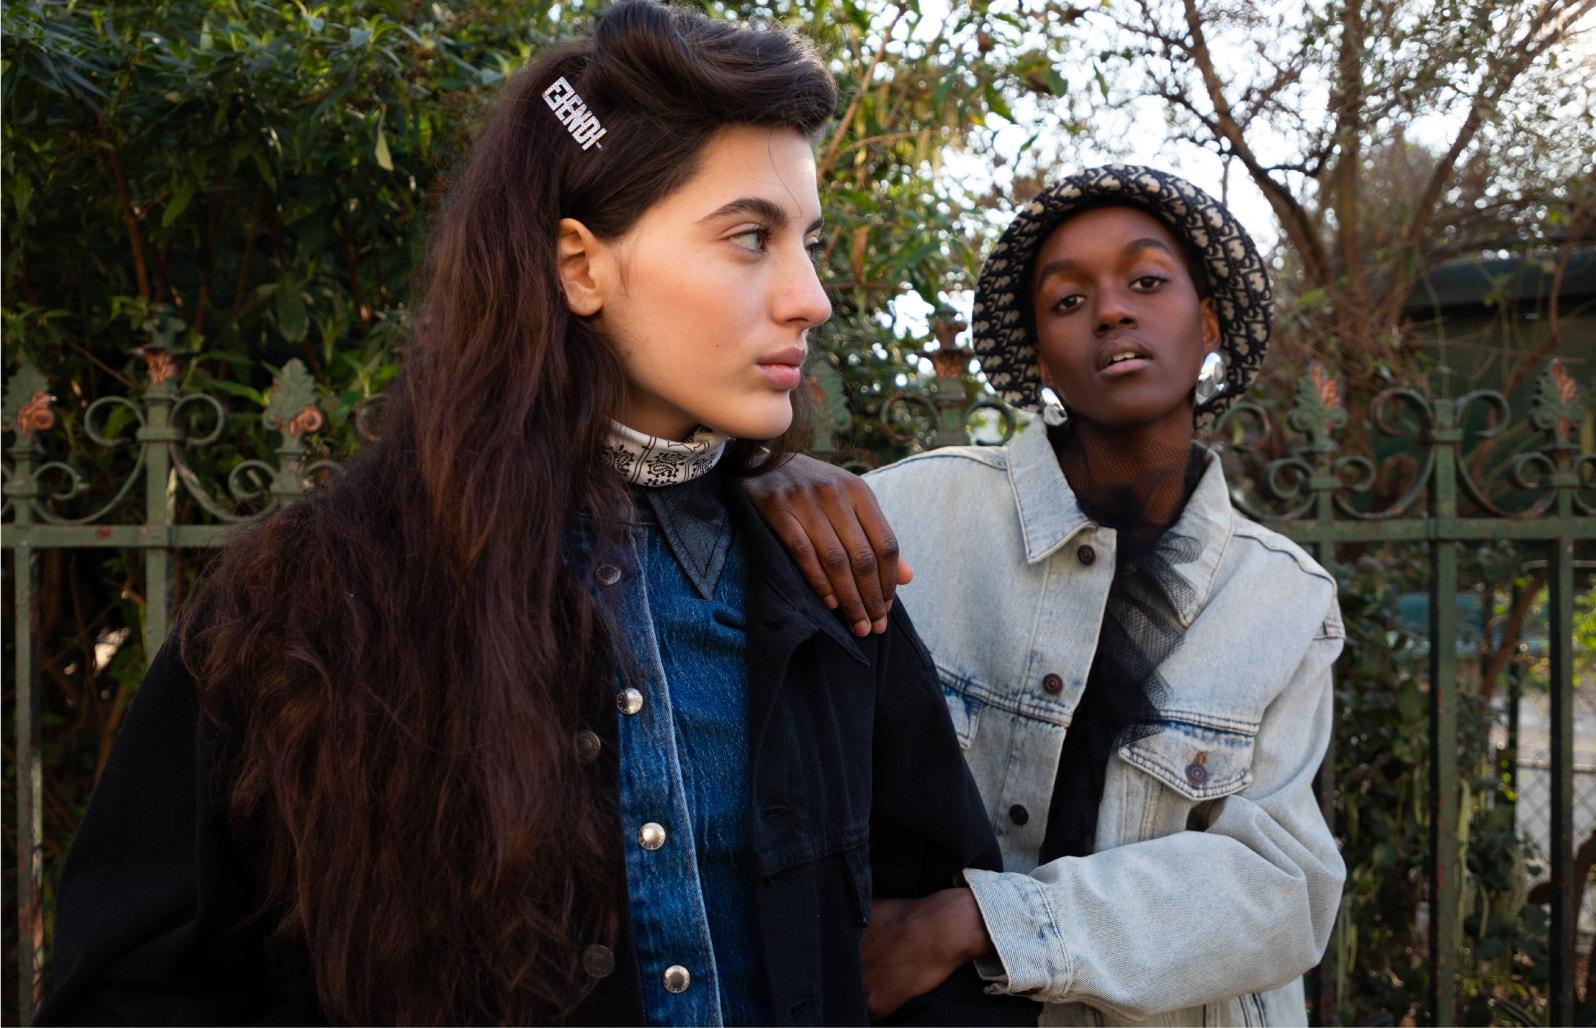 women wearing balenciaga denim Jacket, alexander wang shirt, re/done jeans, fendi hair clip, and dior bucket hat